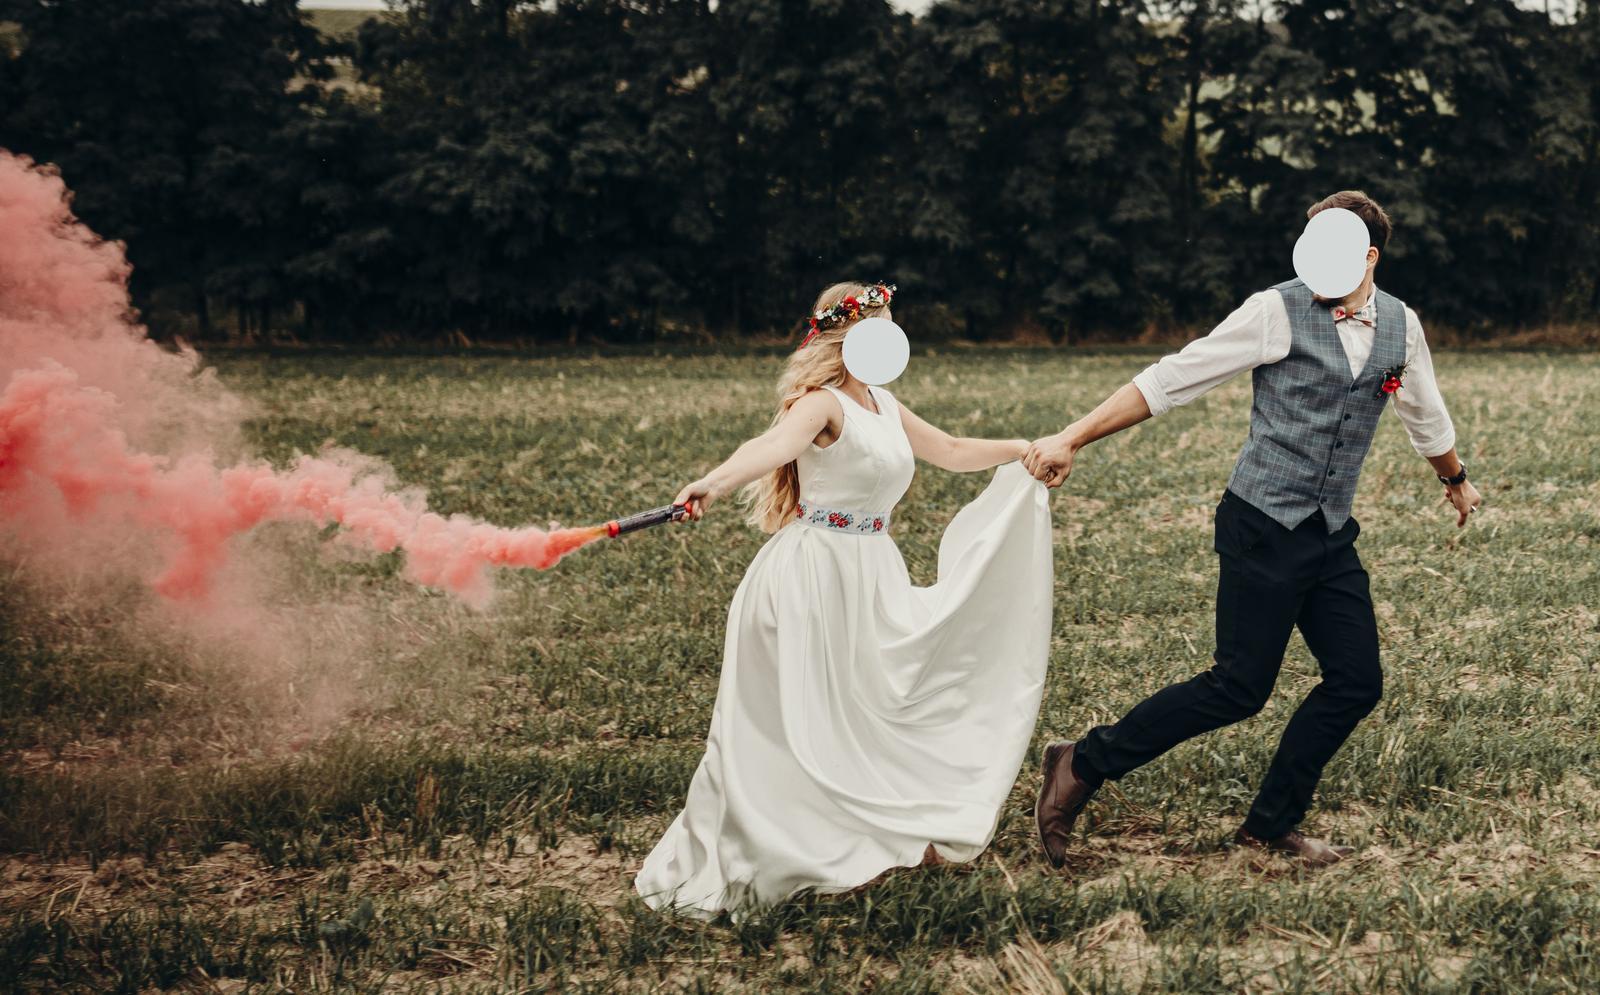 Jednoduche svadobne saty 36 - Obrázok č. 1